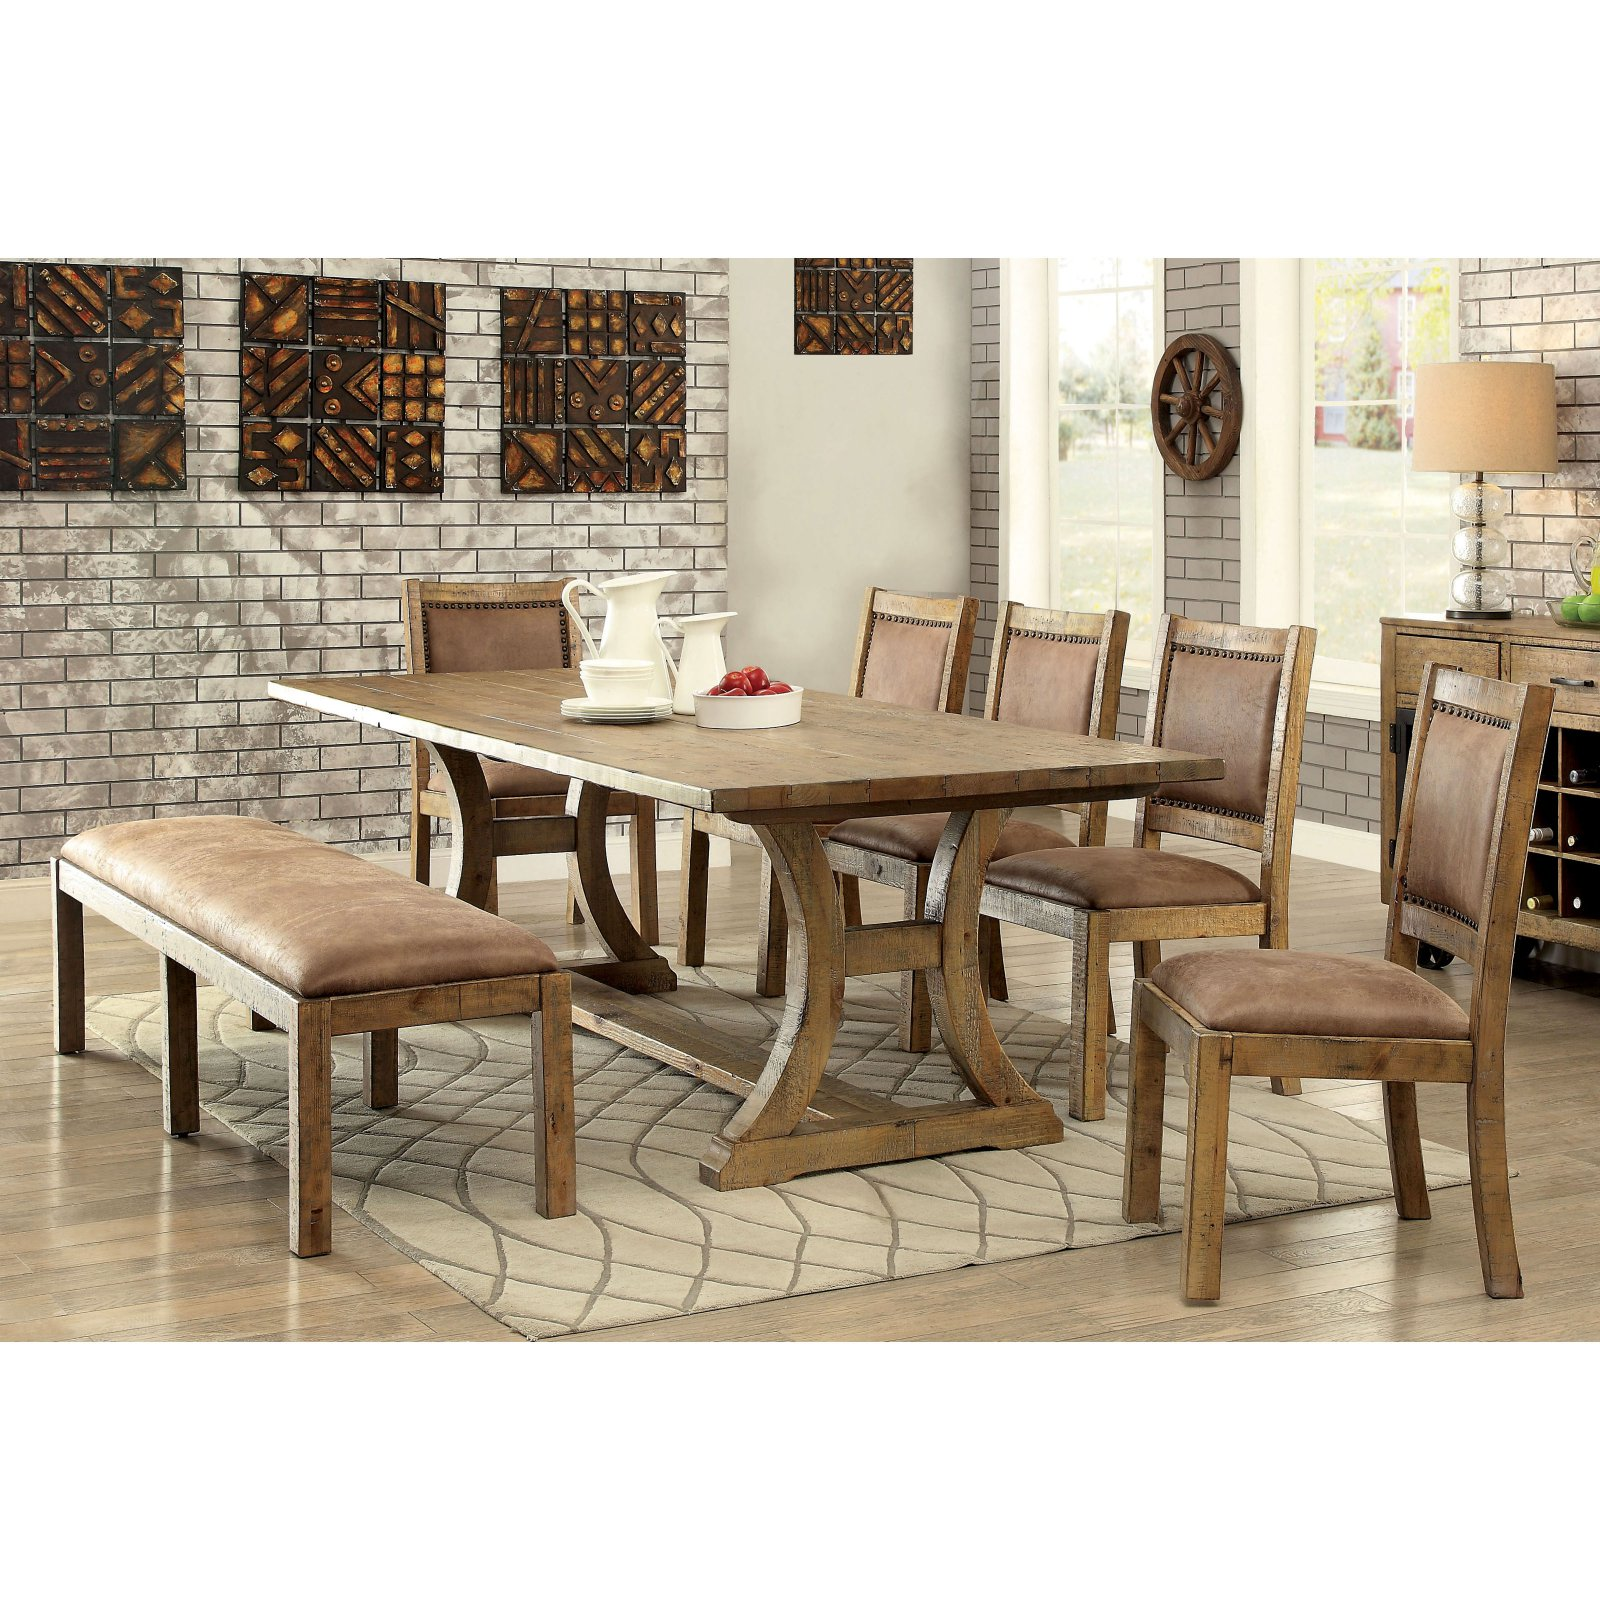 Furniture of America Camen 7-Piece Dining Set